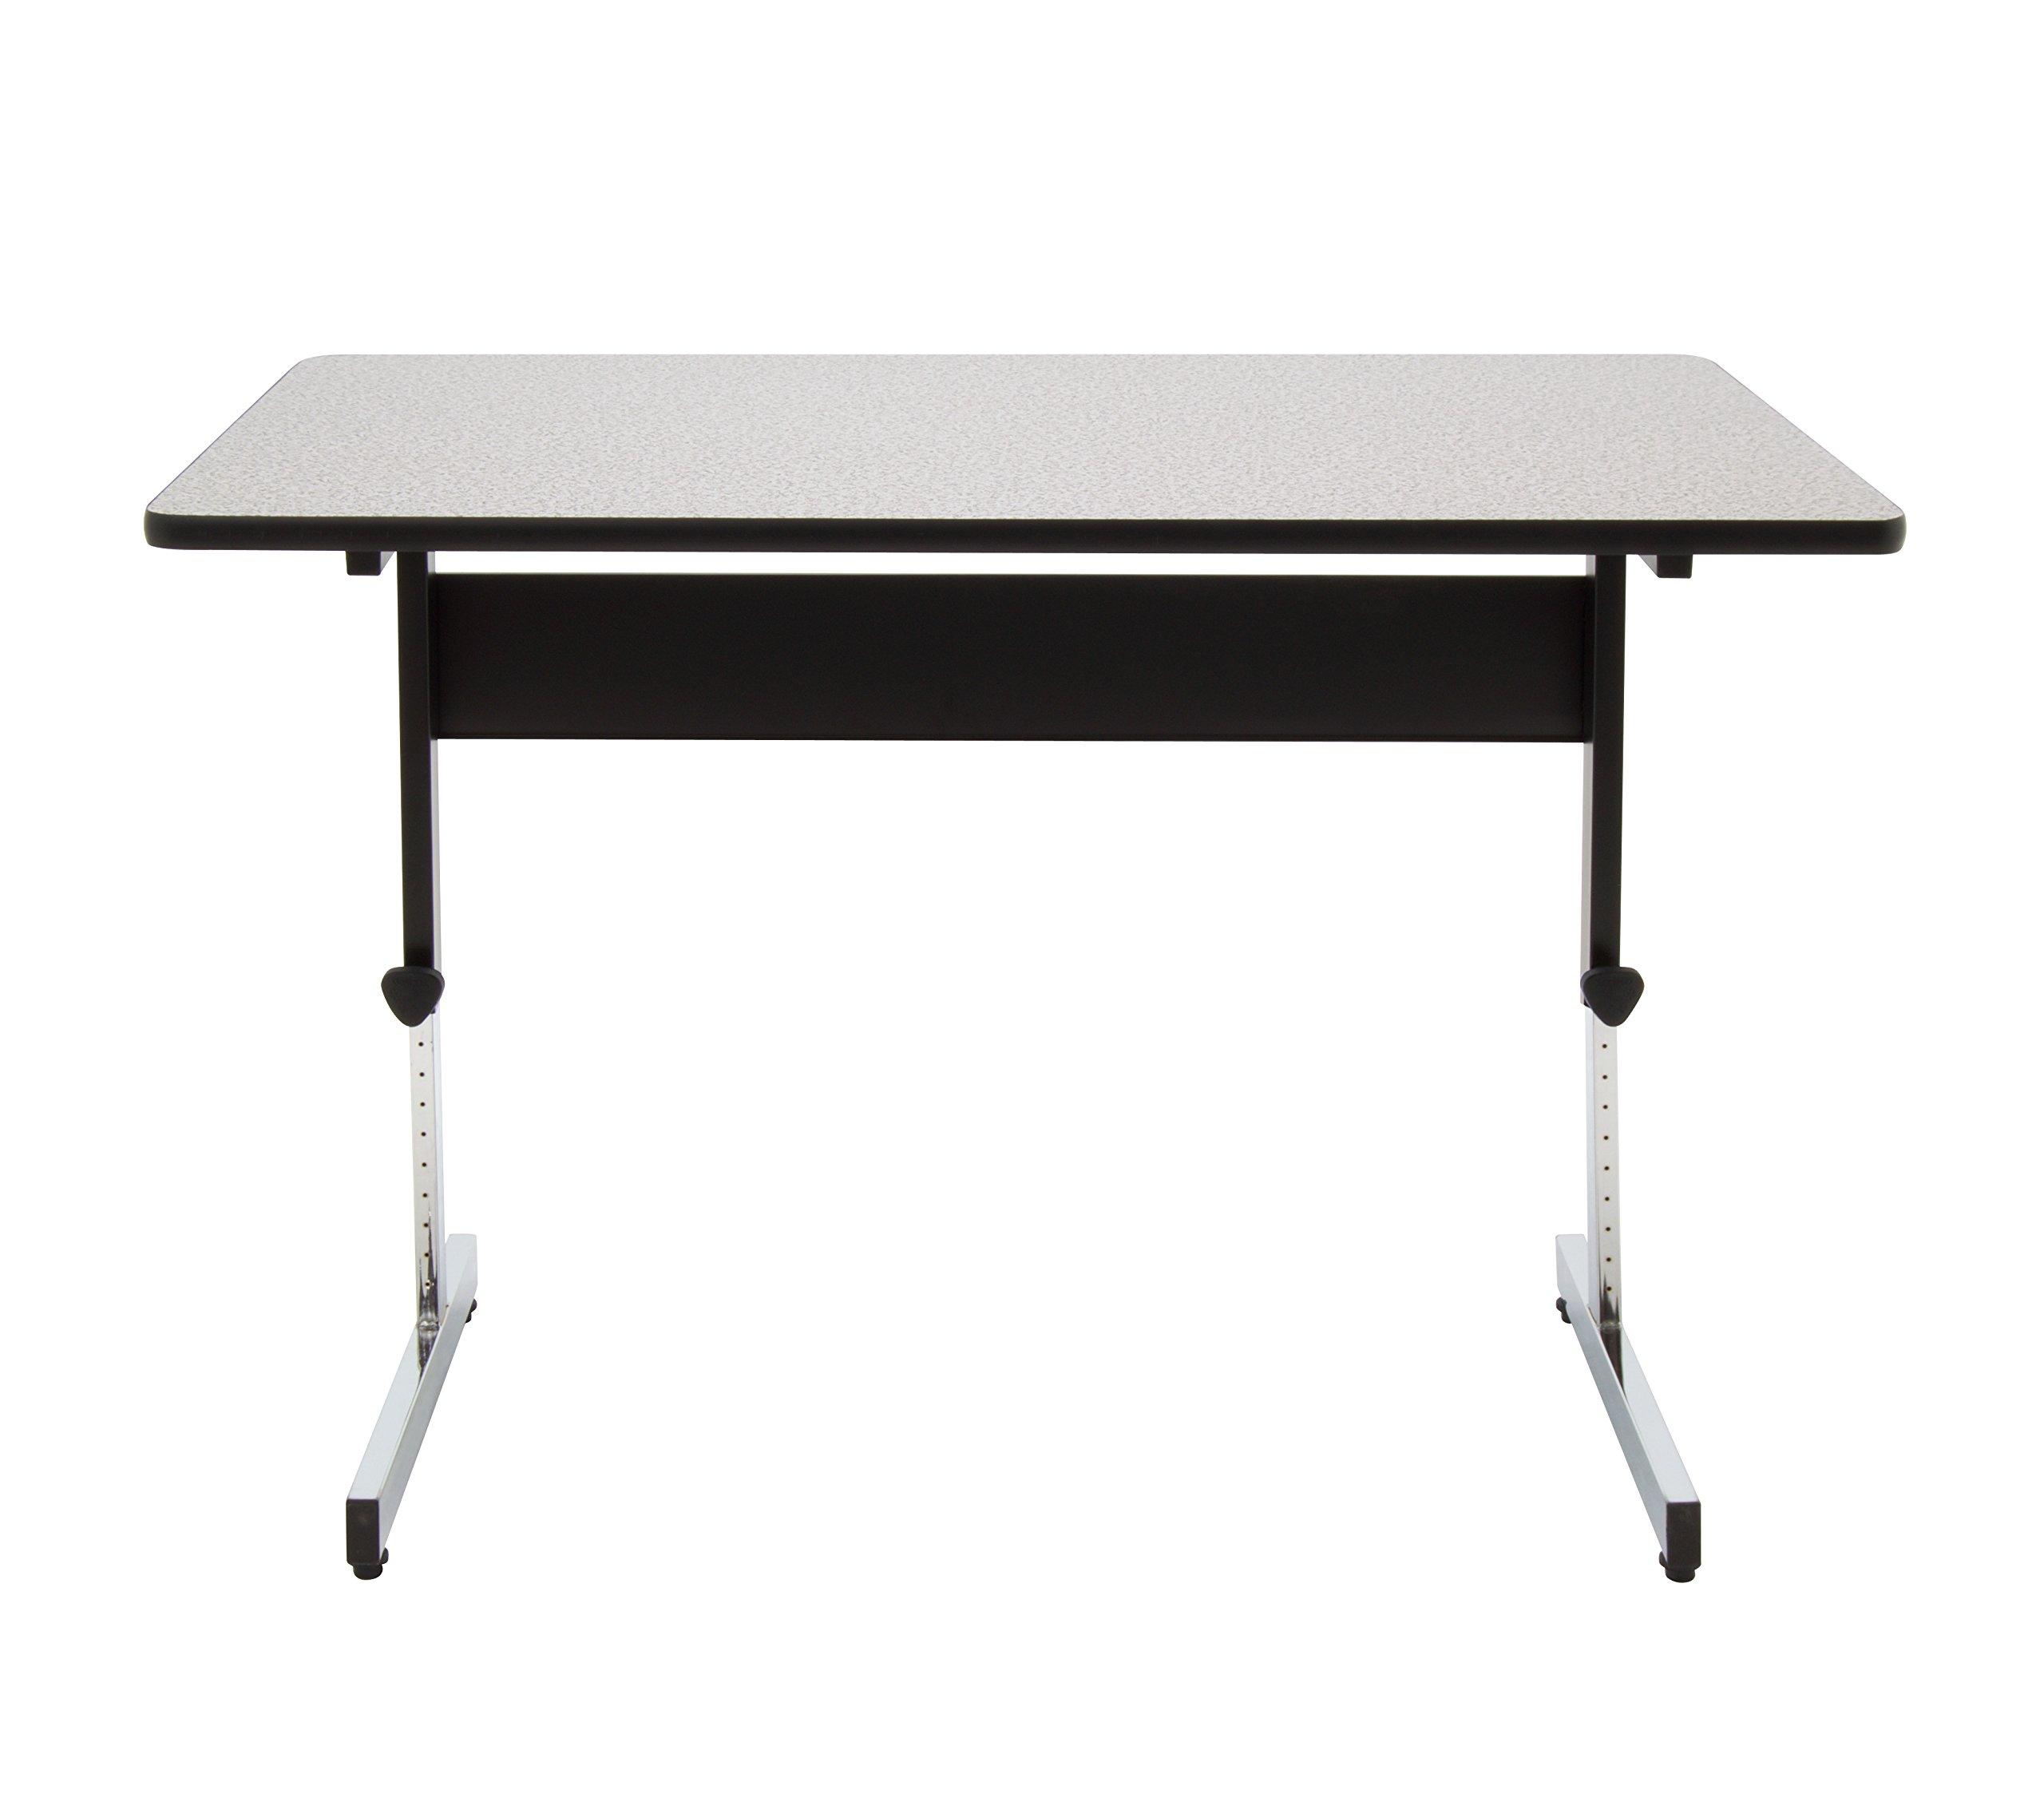 Calico Designs 410382.0 Adapta Desk, 48'', Black/Spatter Gray